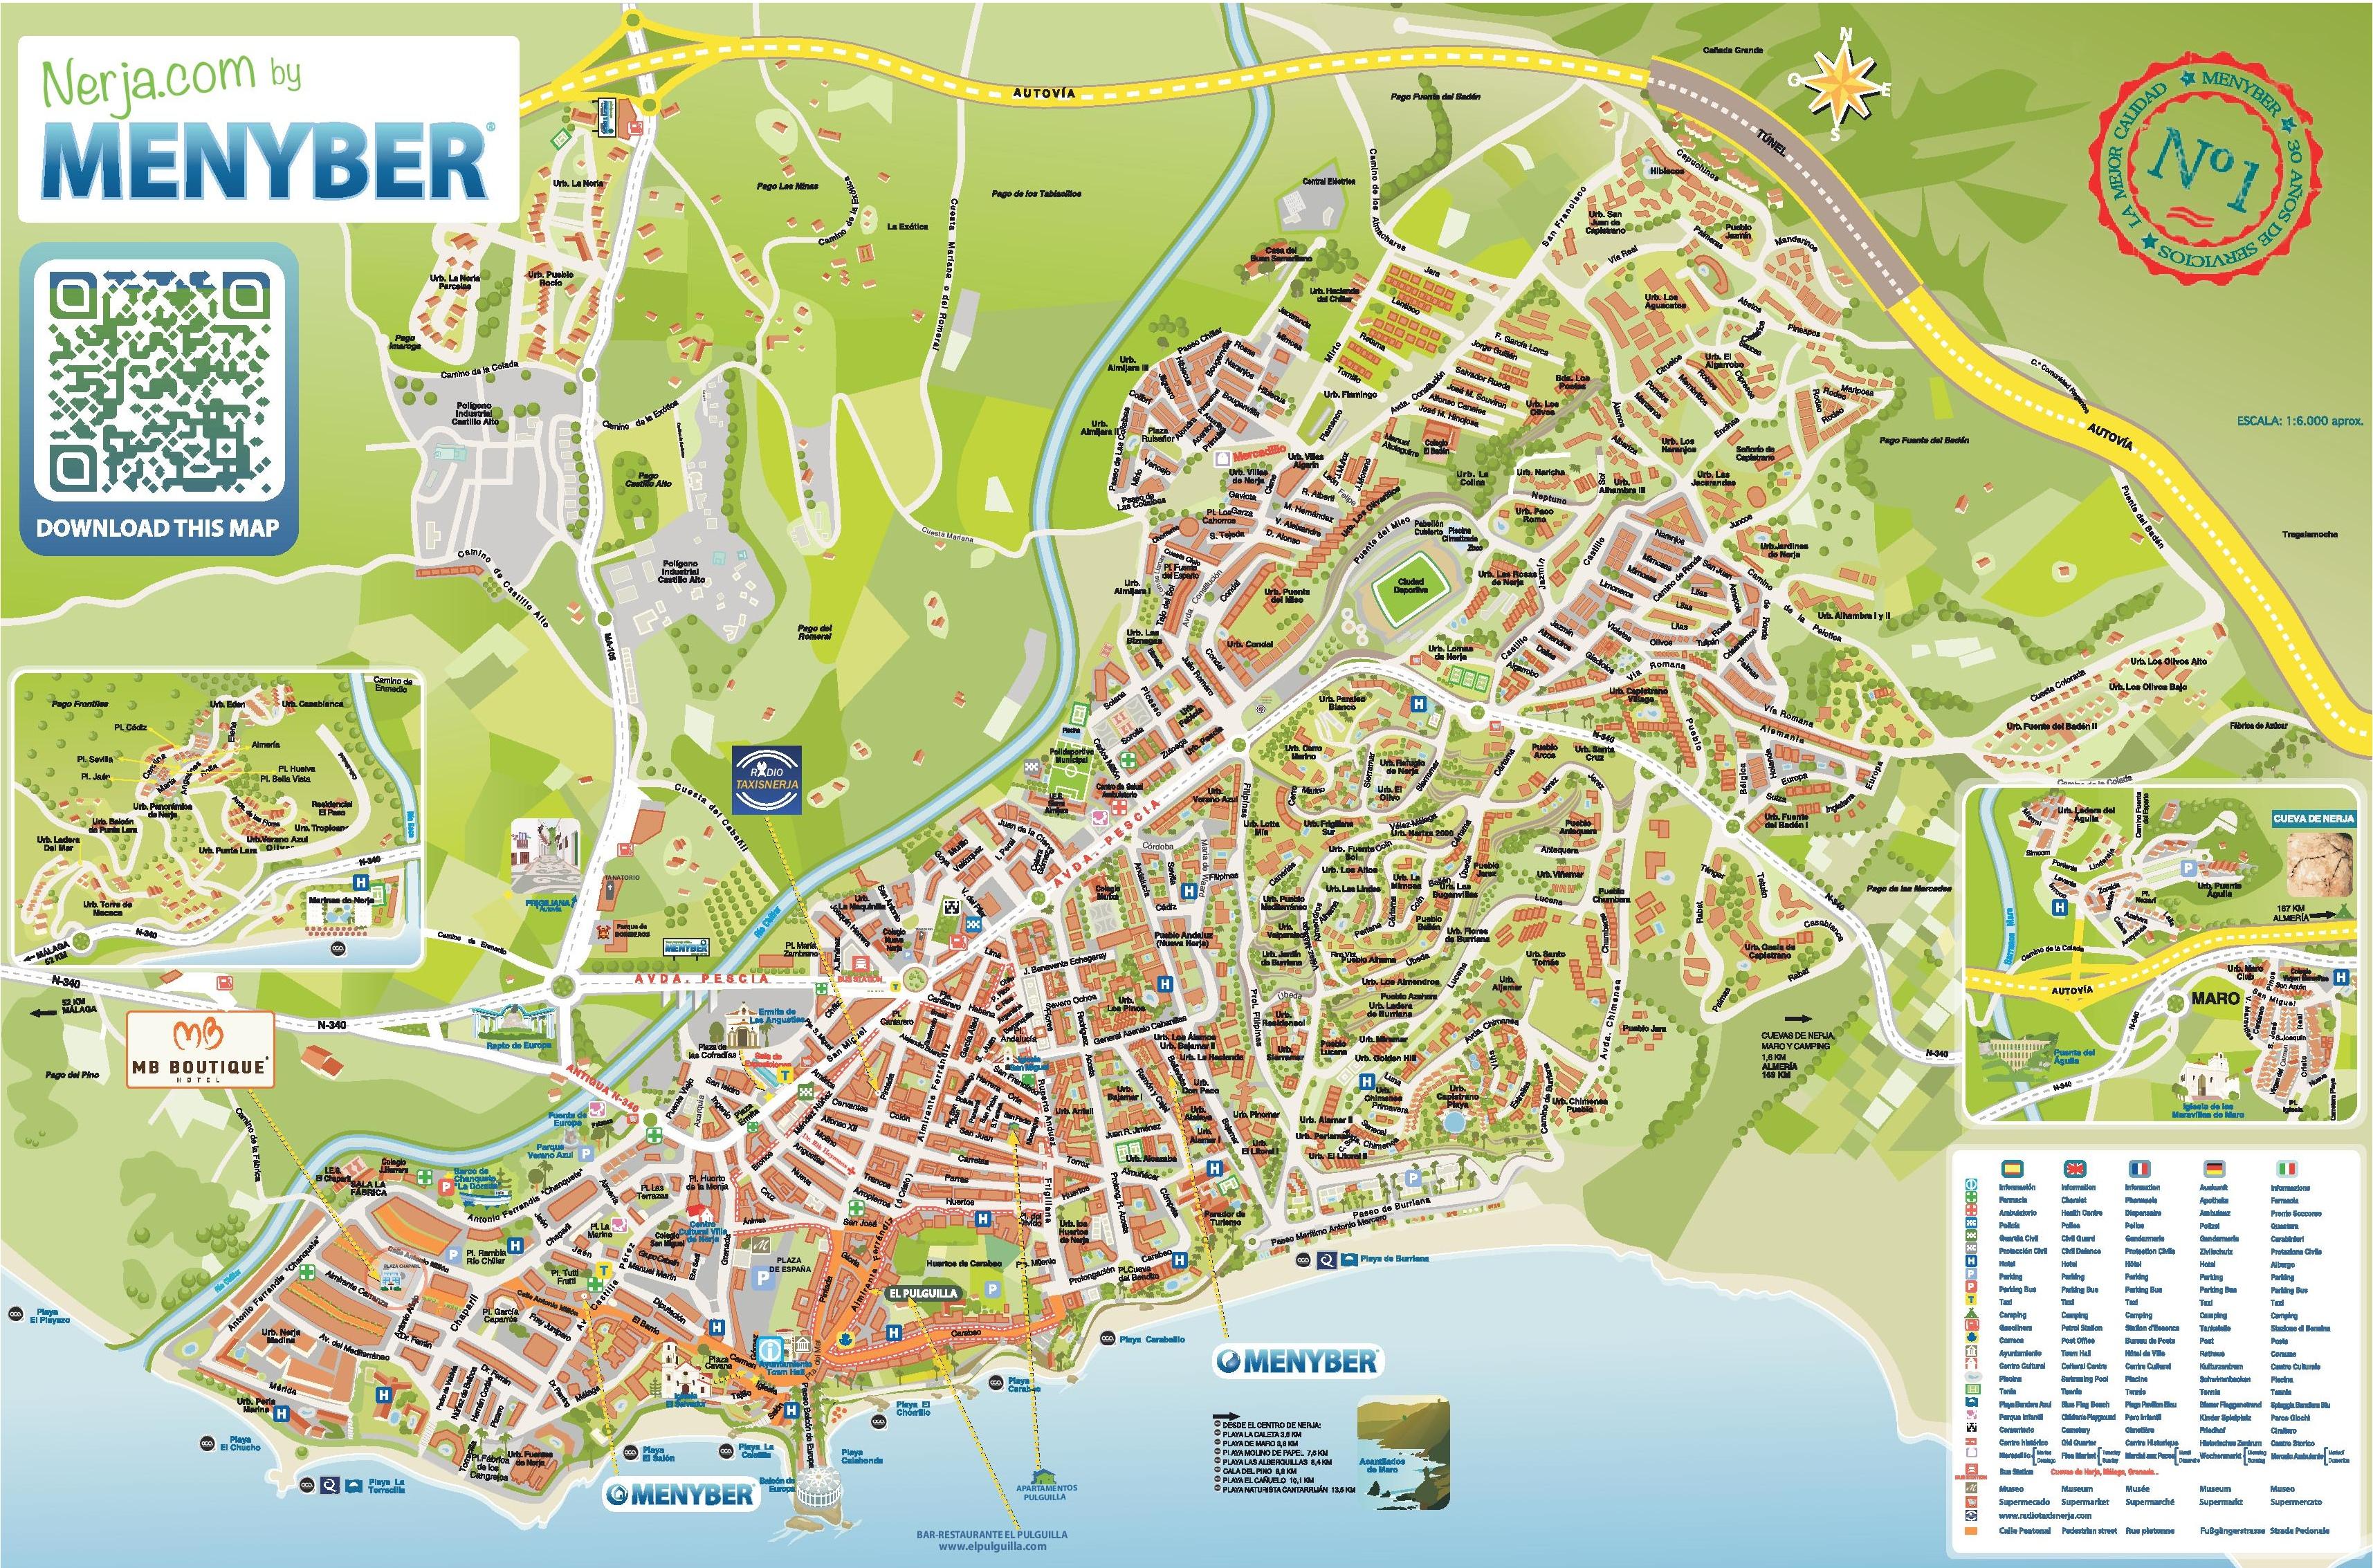 Map Of Nerja Nerja hotels and sightseeings map Map Of Nerja